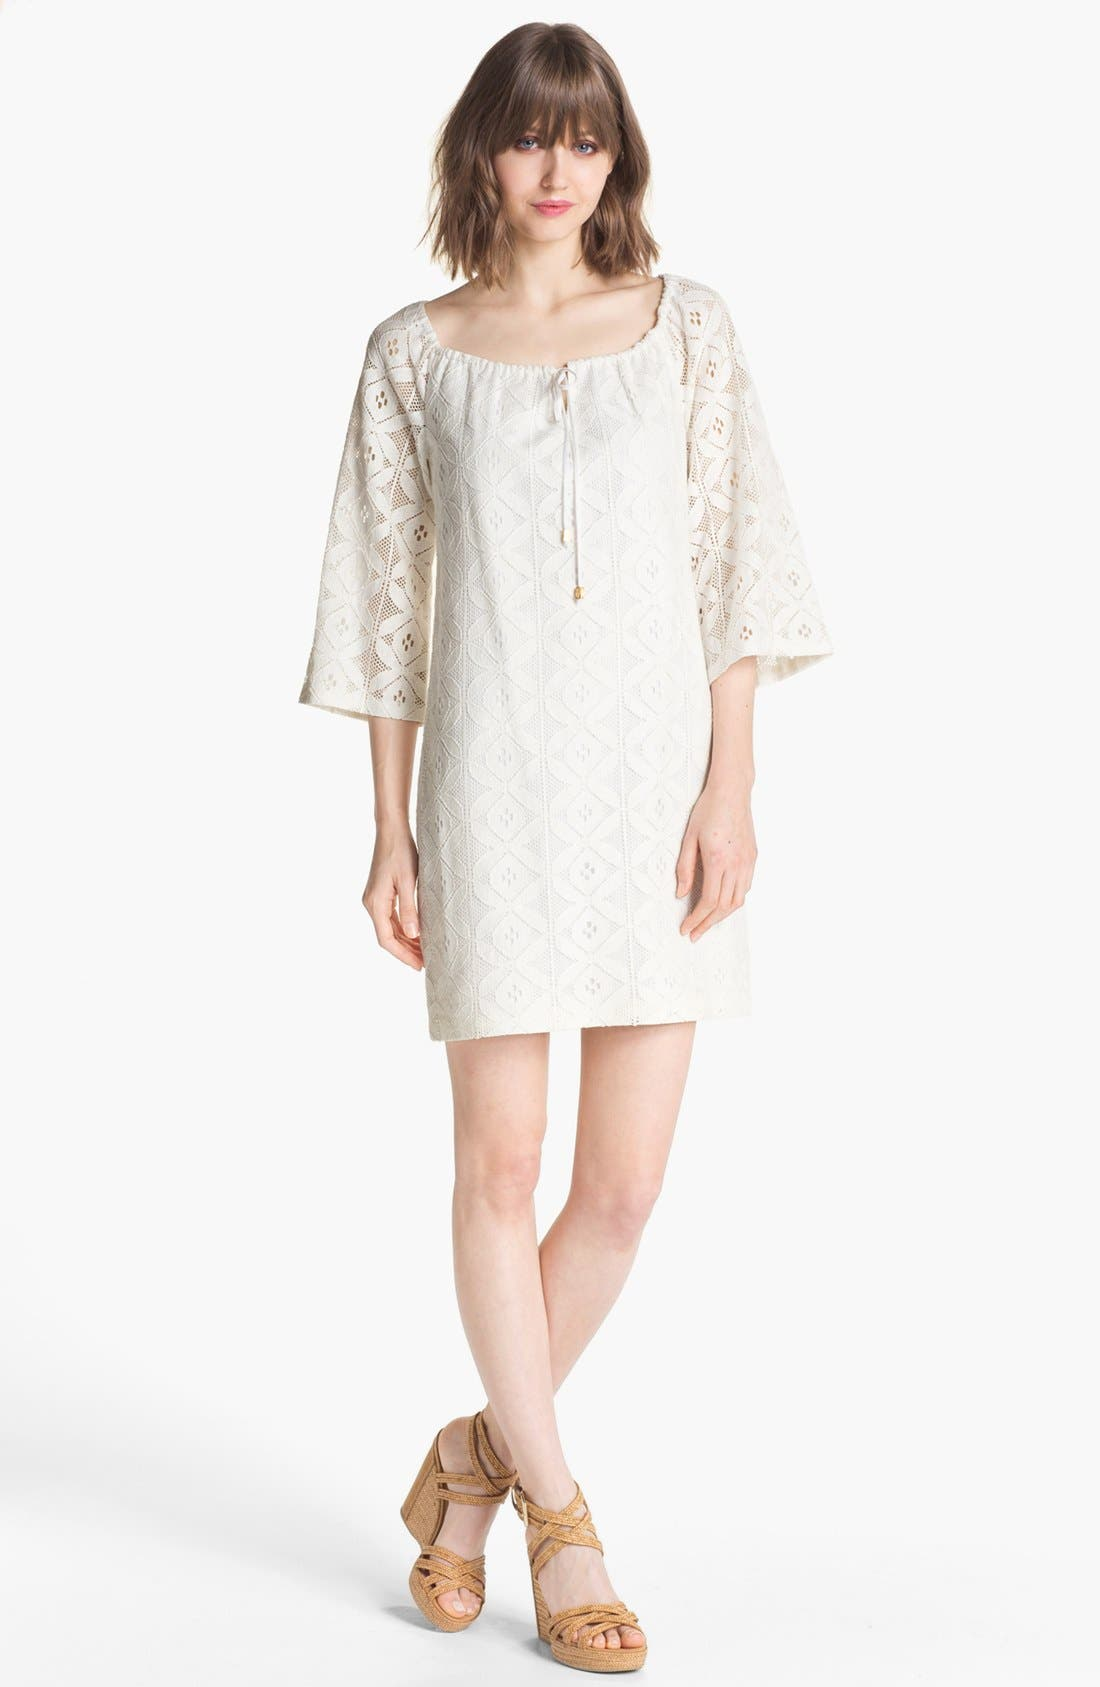 Main Image - Trina Turk 'Amplify' Bell Sleeve Lace Shift Dress